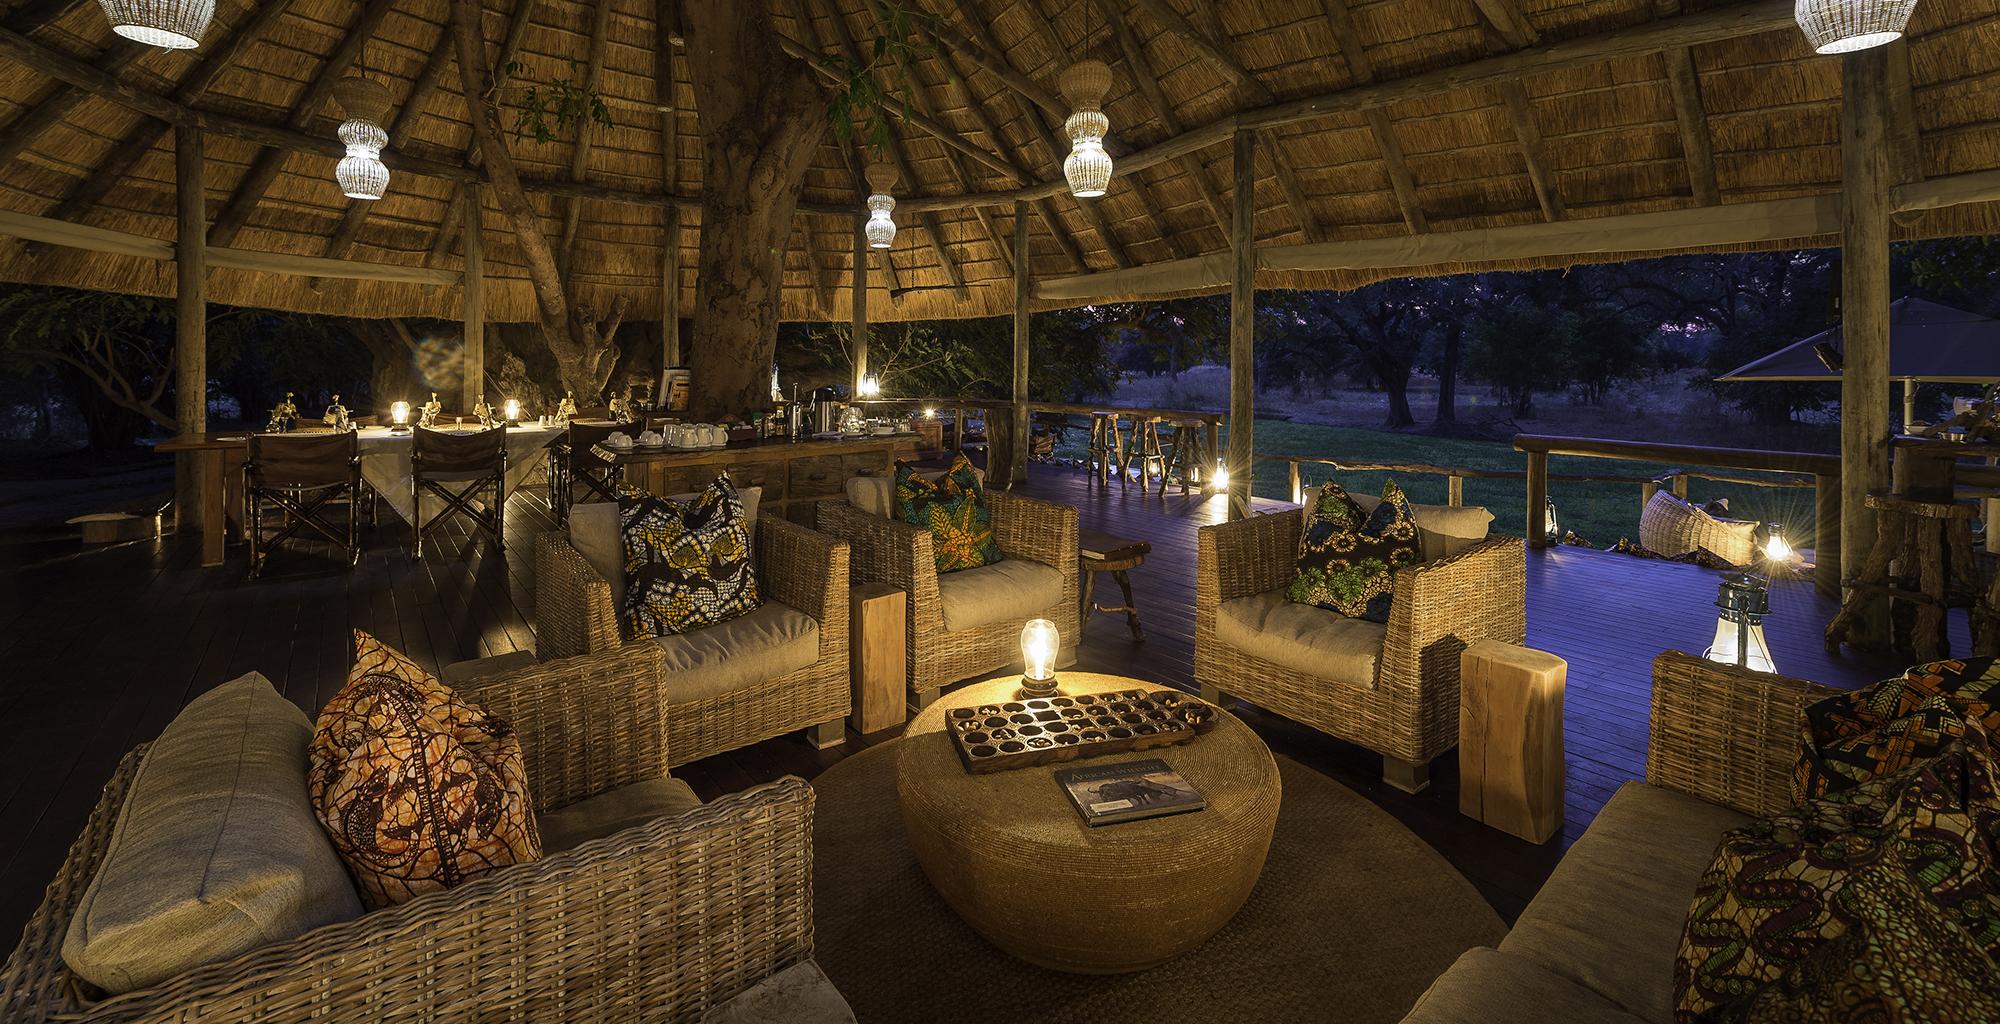 Zambia-Bilimungwe-Bushcamp-Living-Room